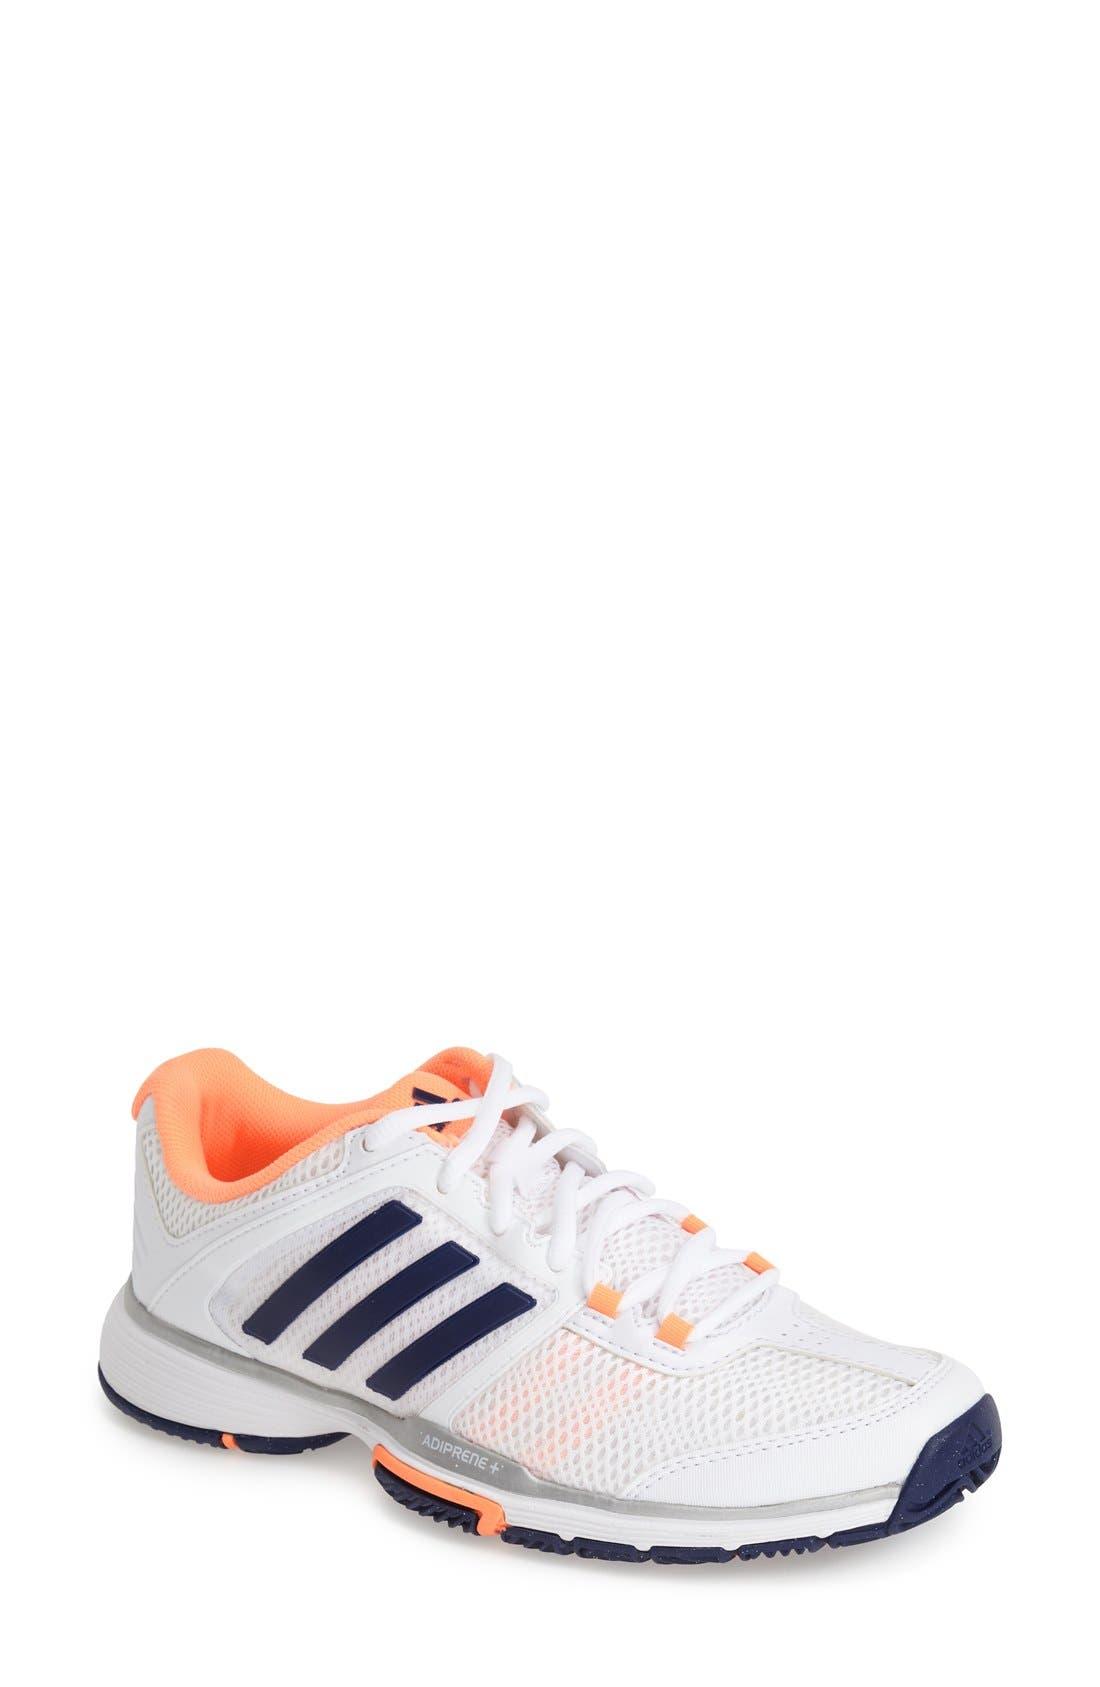 Main Image - adidas 'adiPower Barricade Team 4' Tennis Shoe (Women)